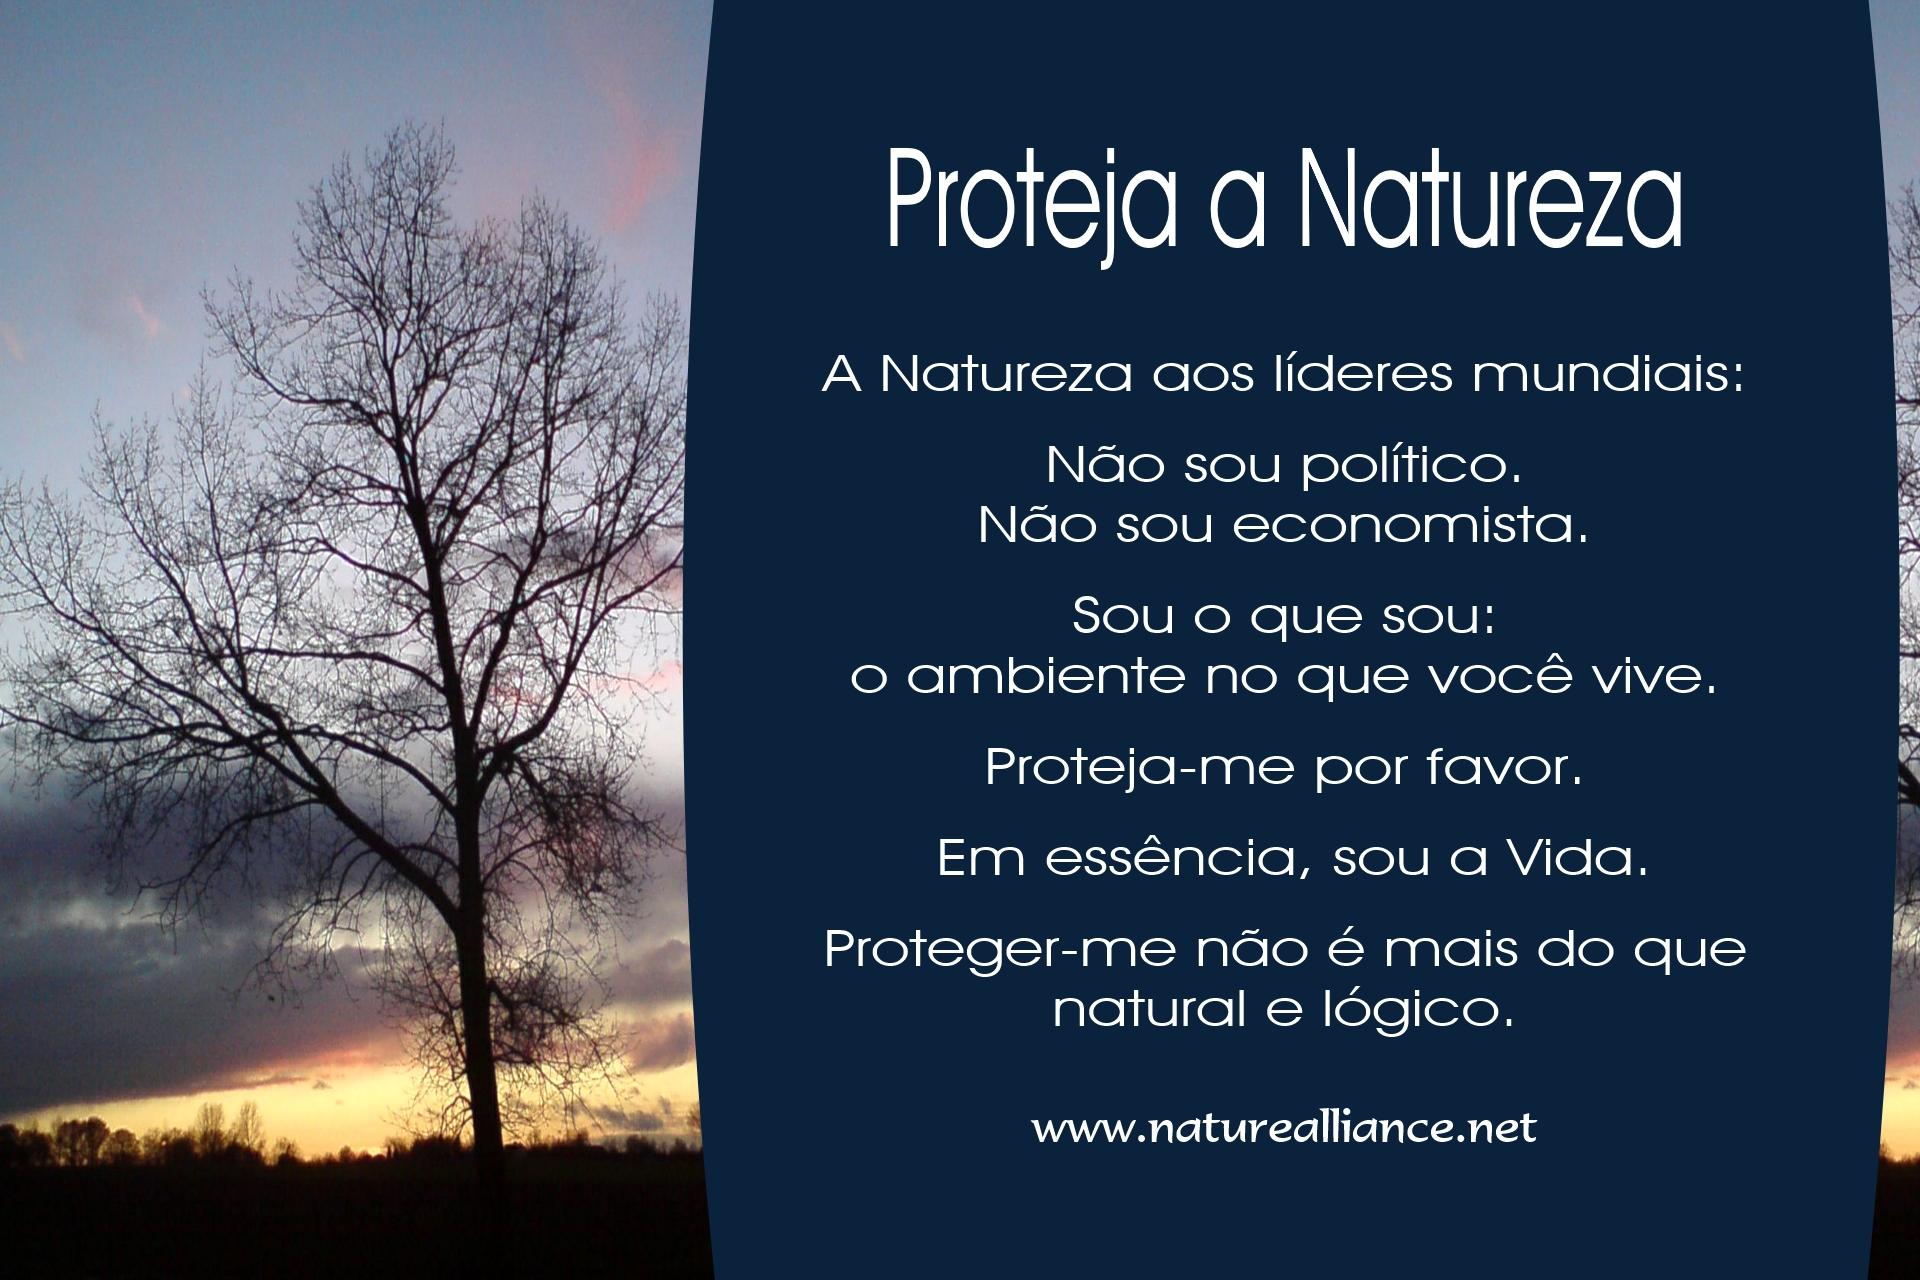 Proteja a Natureza